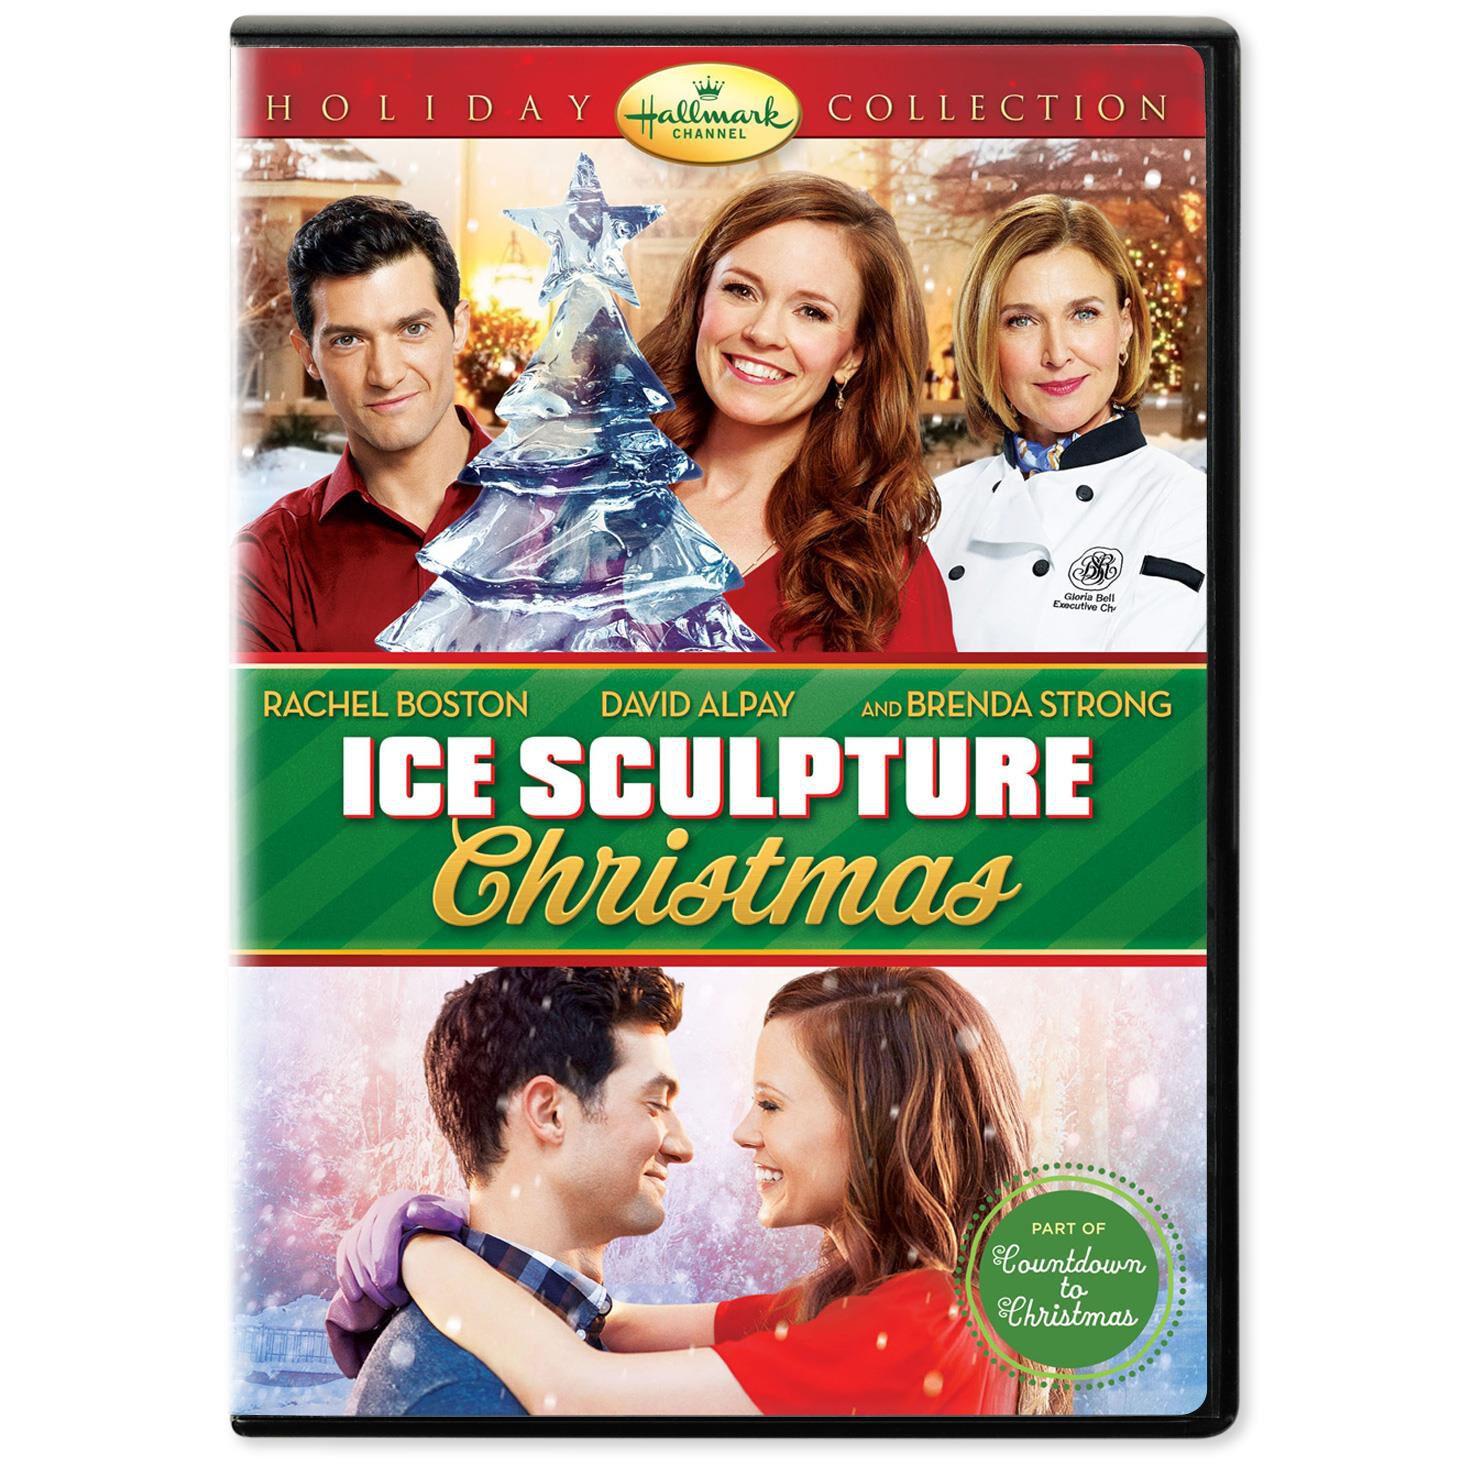 Ice Sculpture Christmas - Hallmark Channel - Hallmark